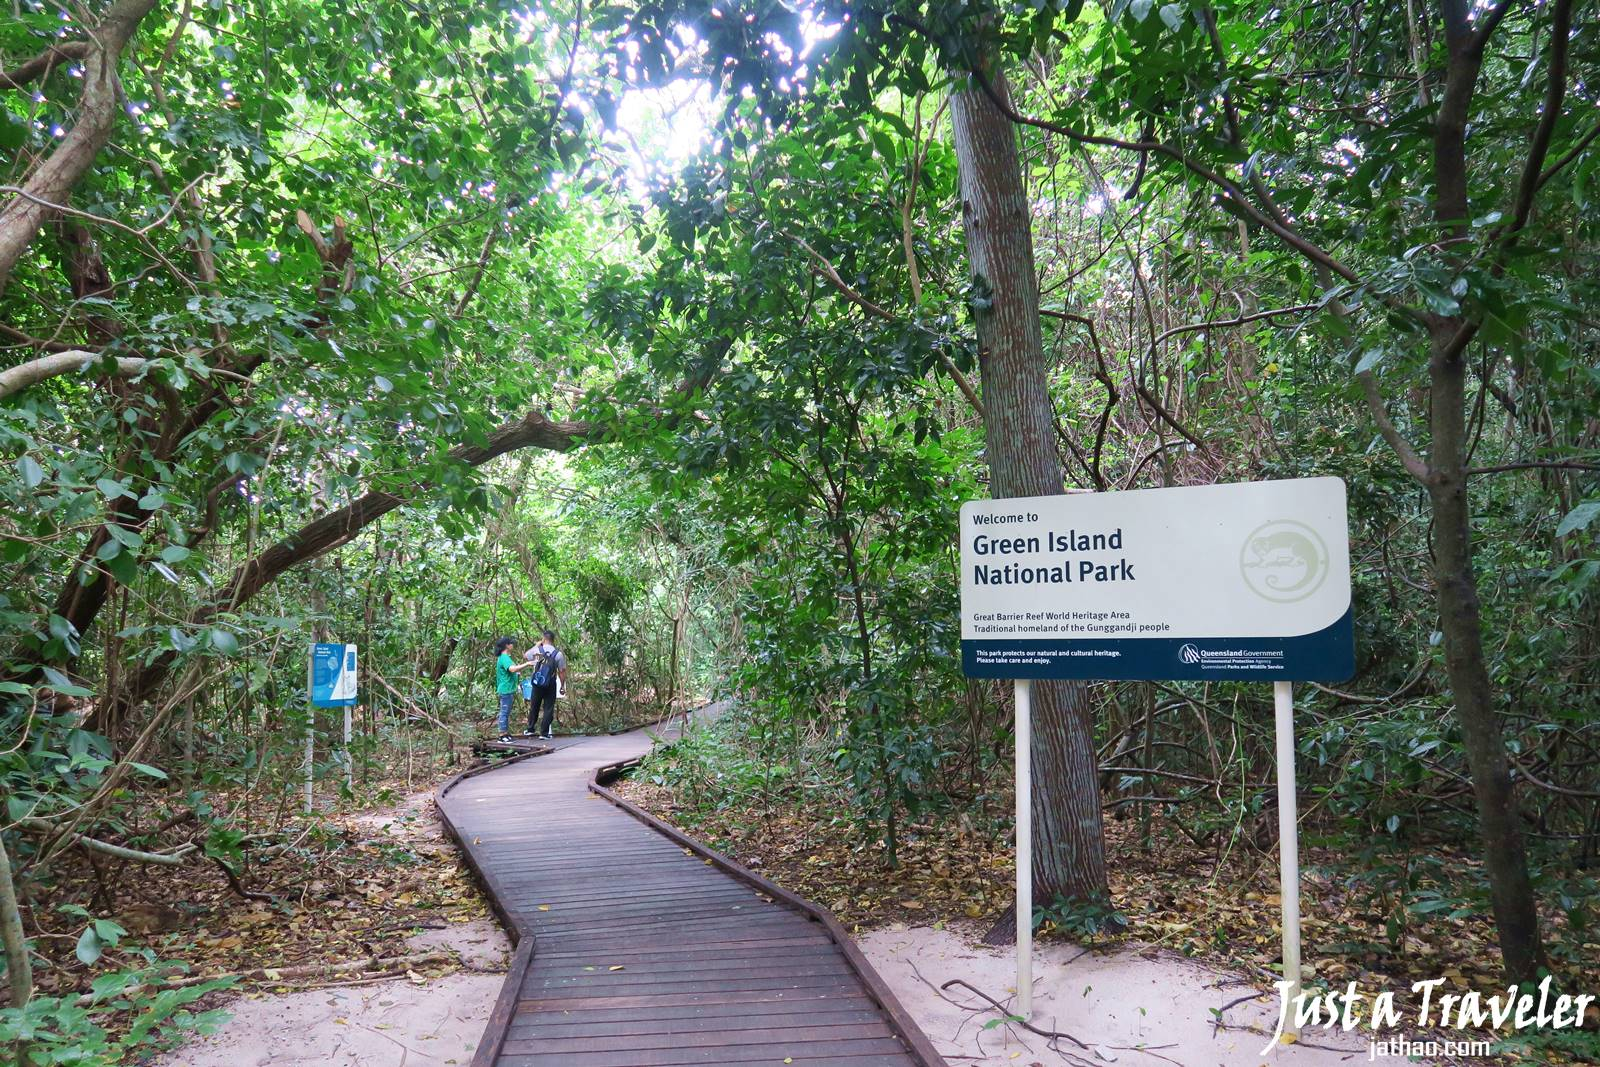 凱恩斯-大堡礁-綠島-內堡礁-國家公園-推薦-旅遊-自由行-澳洲-Carins-Great-Barrier-Reef-Green-Island-National-Park-Travel-Australia